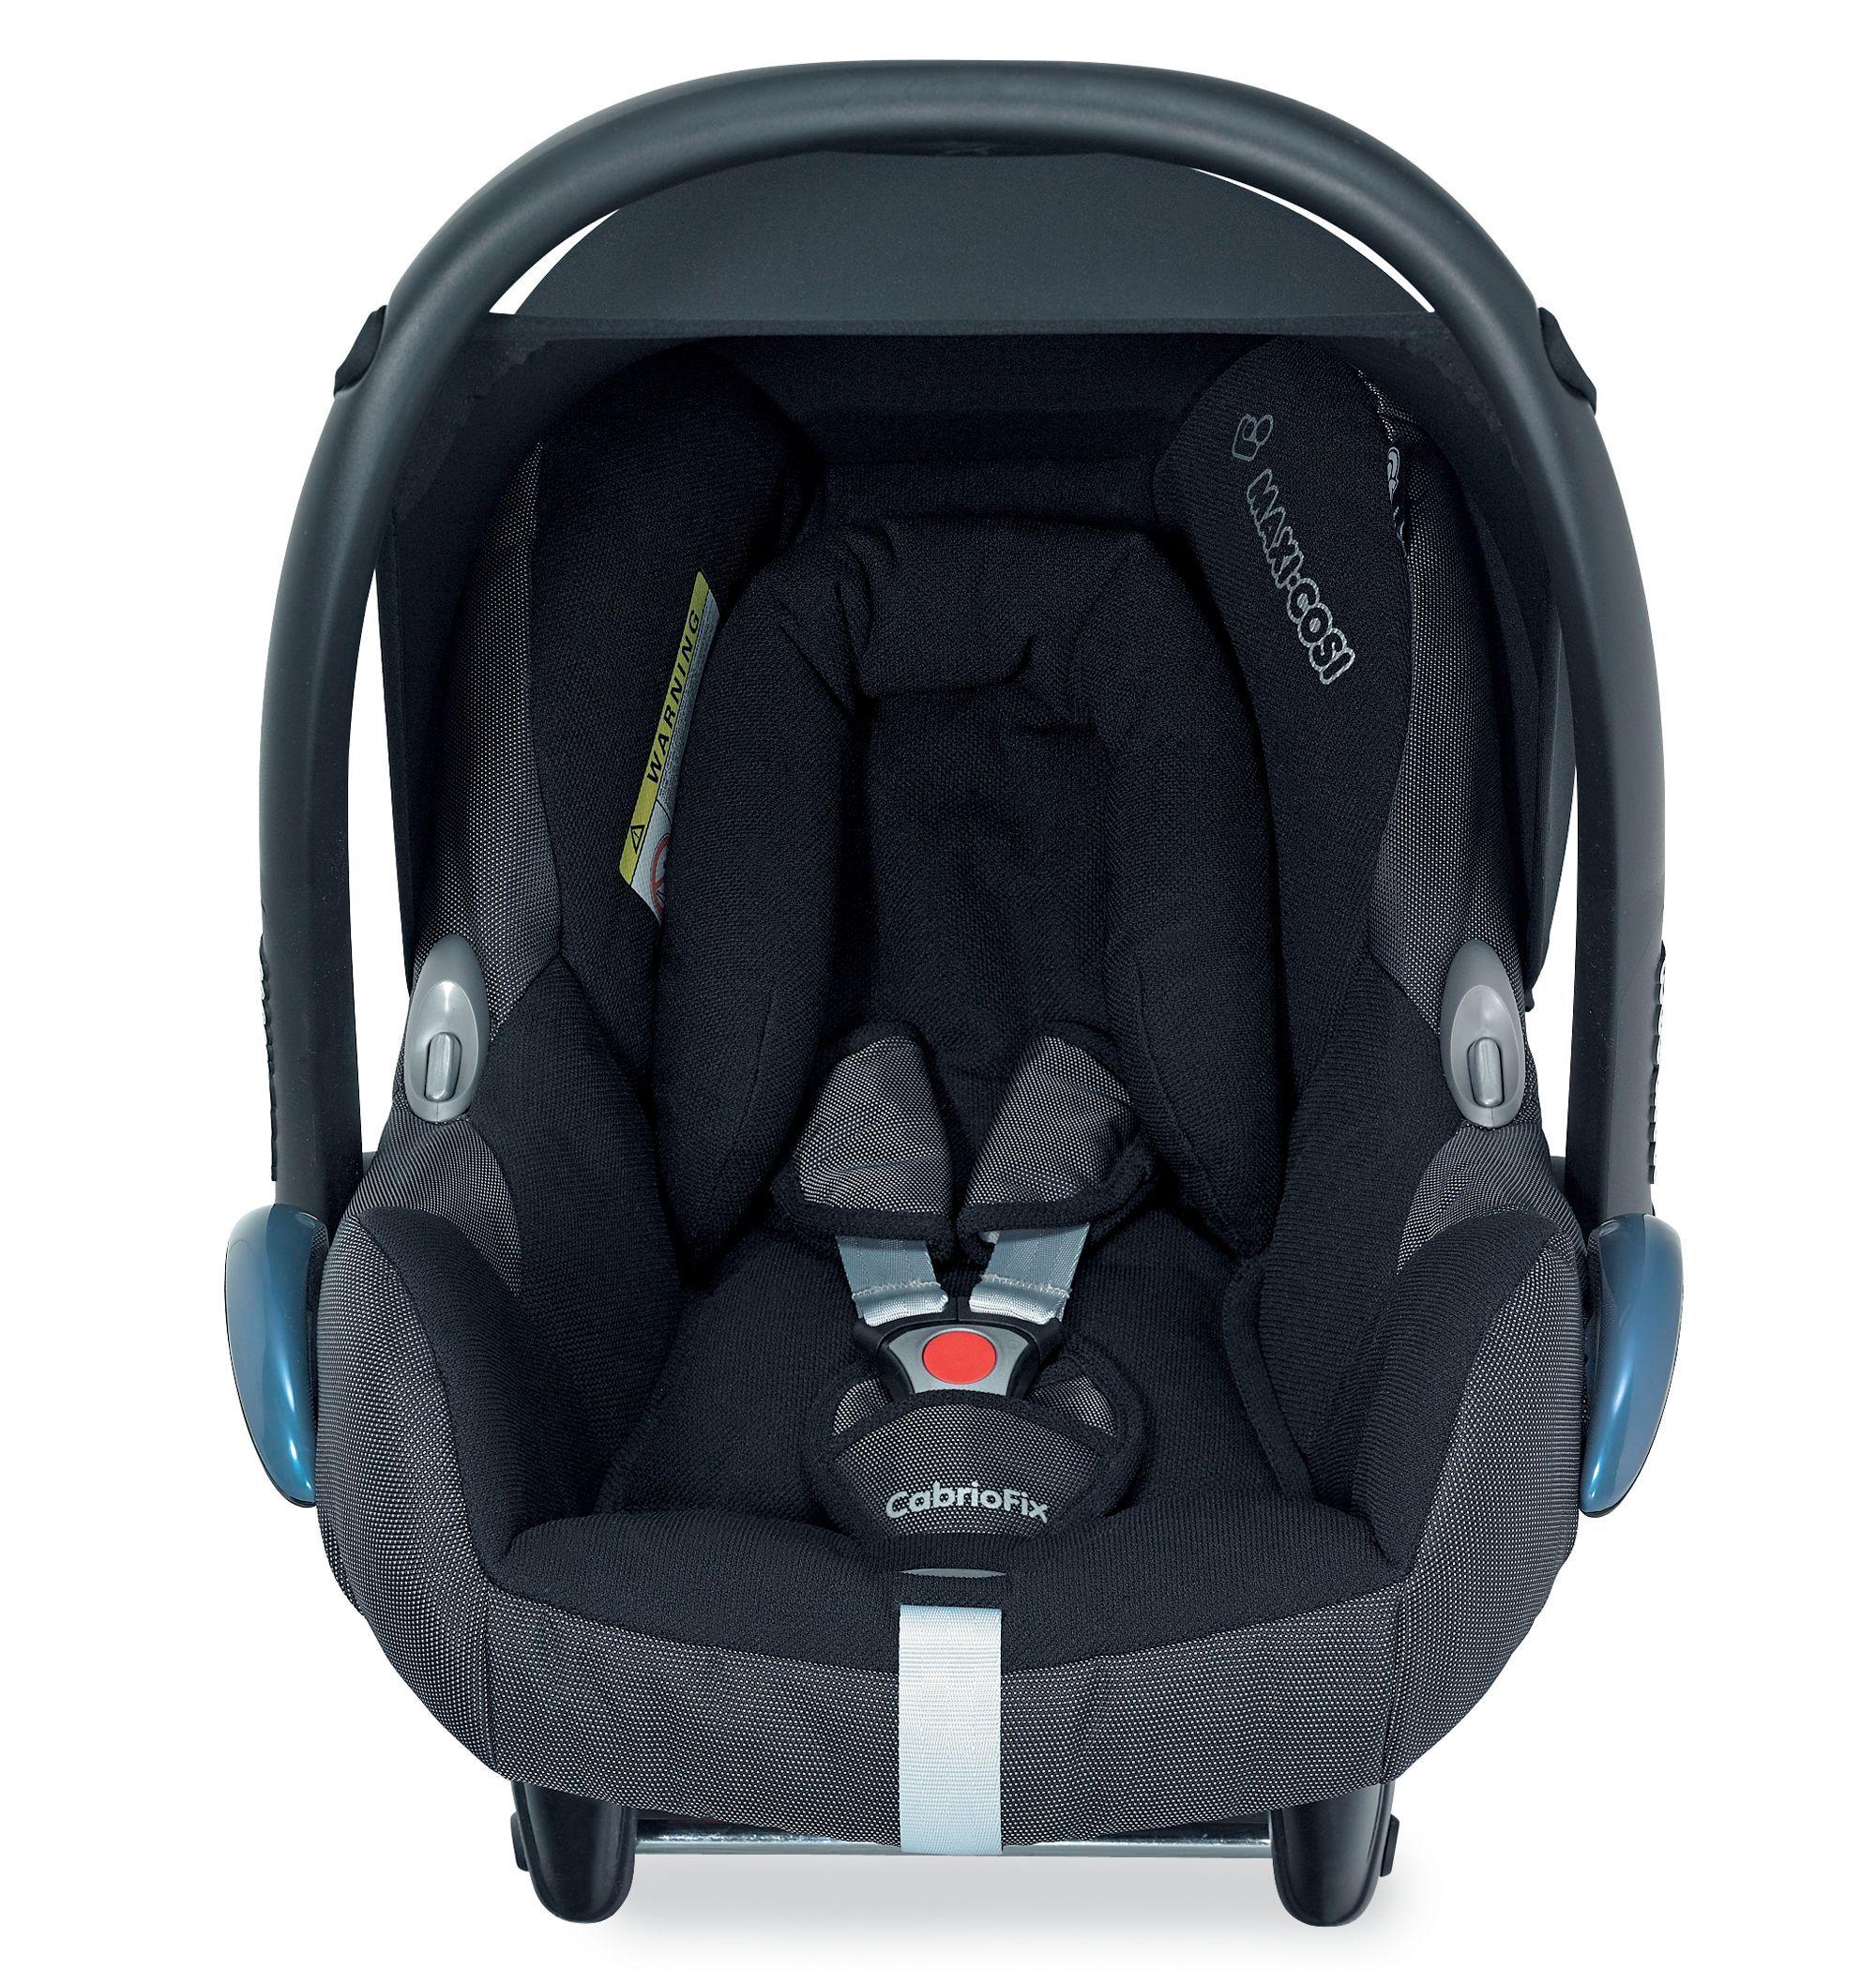 Maxi-Cosi Cabriofix Baby Car Seat - Black Reflection ...